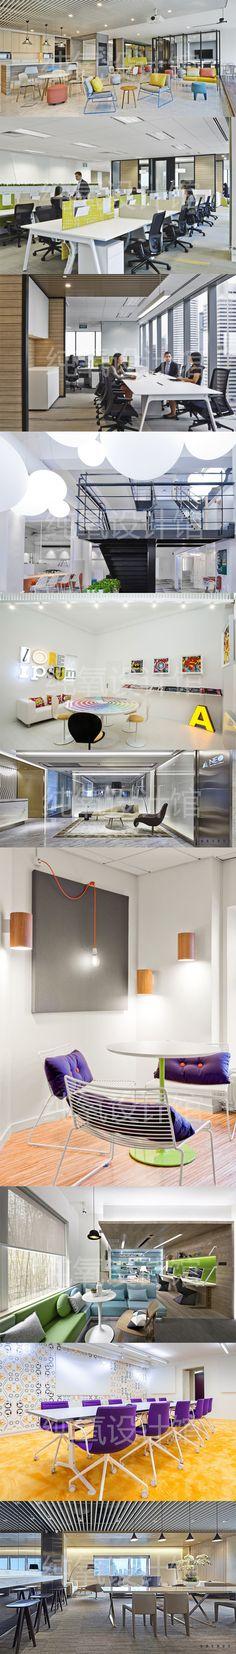 Z12.2 国内外优秀办公空间设计案例 办公室空间设计案例参考图片-淘宝网